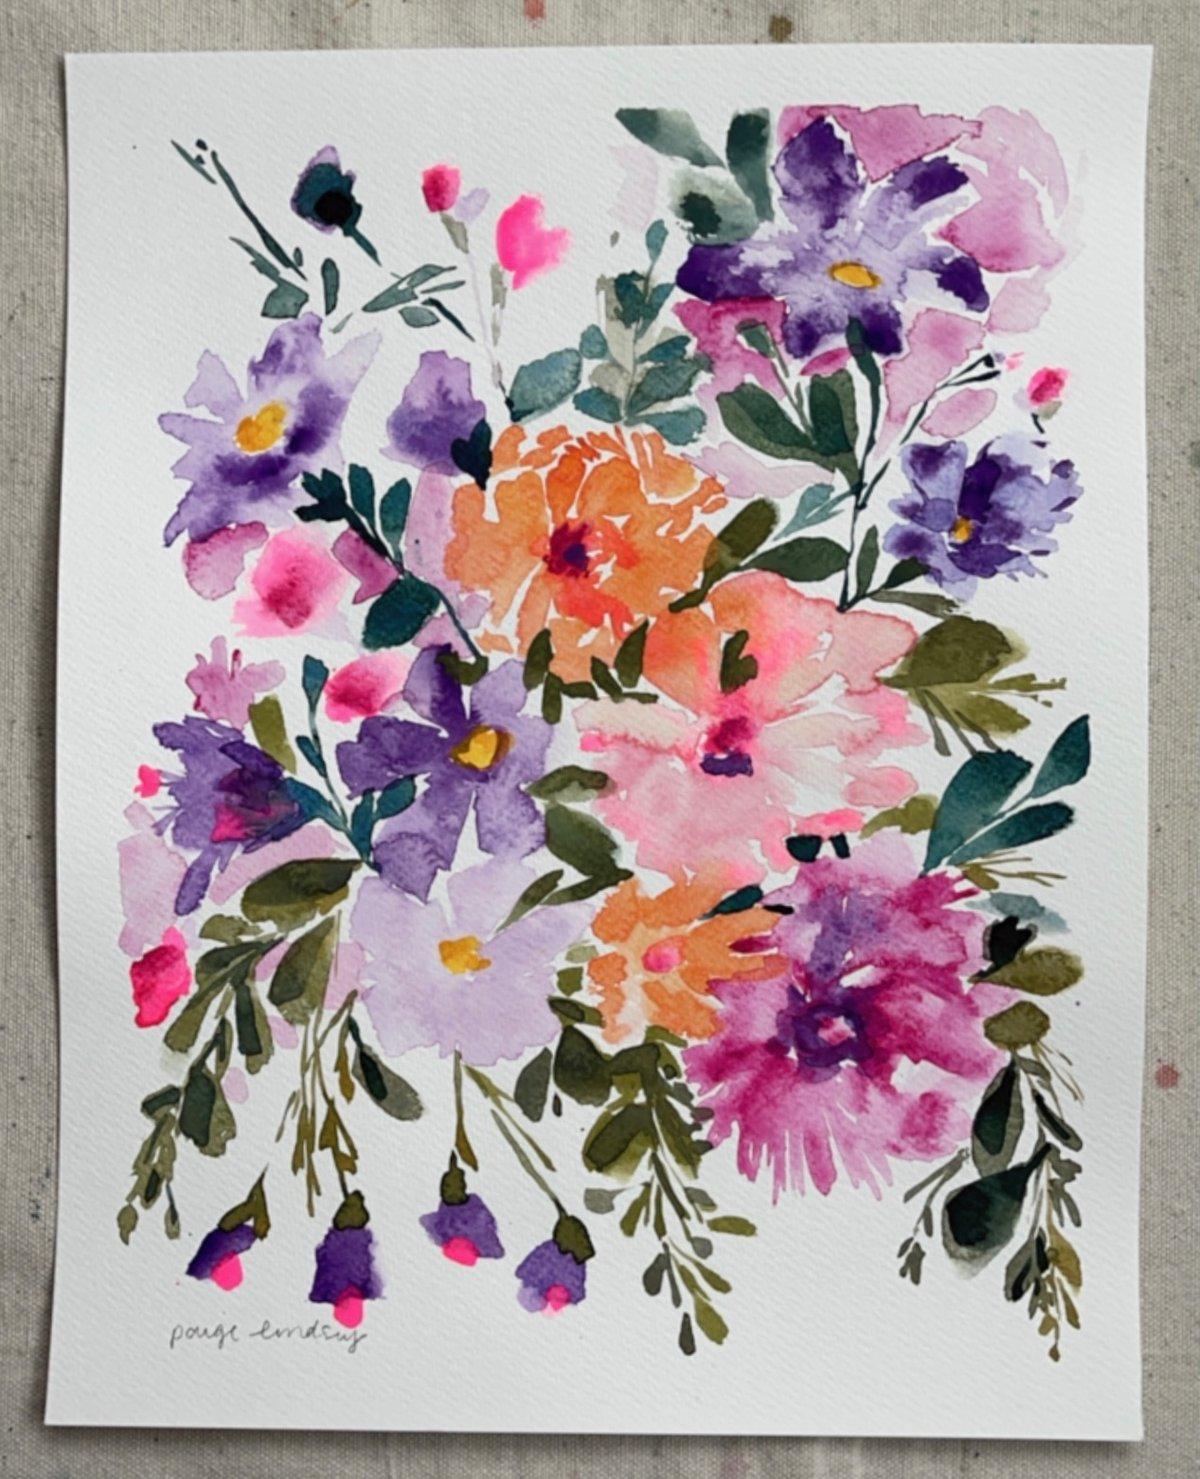 Image of Wild Flower Bouquet II - Original Watercolor Painting